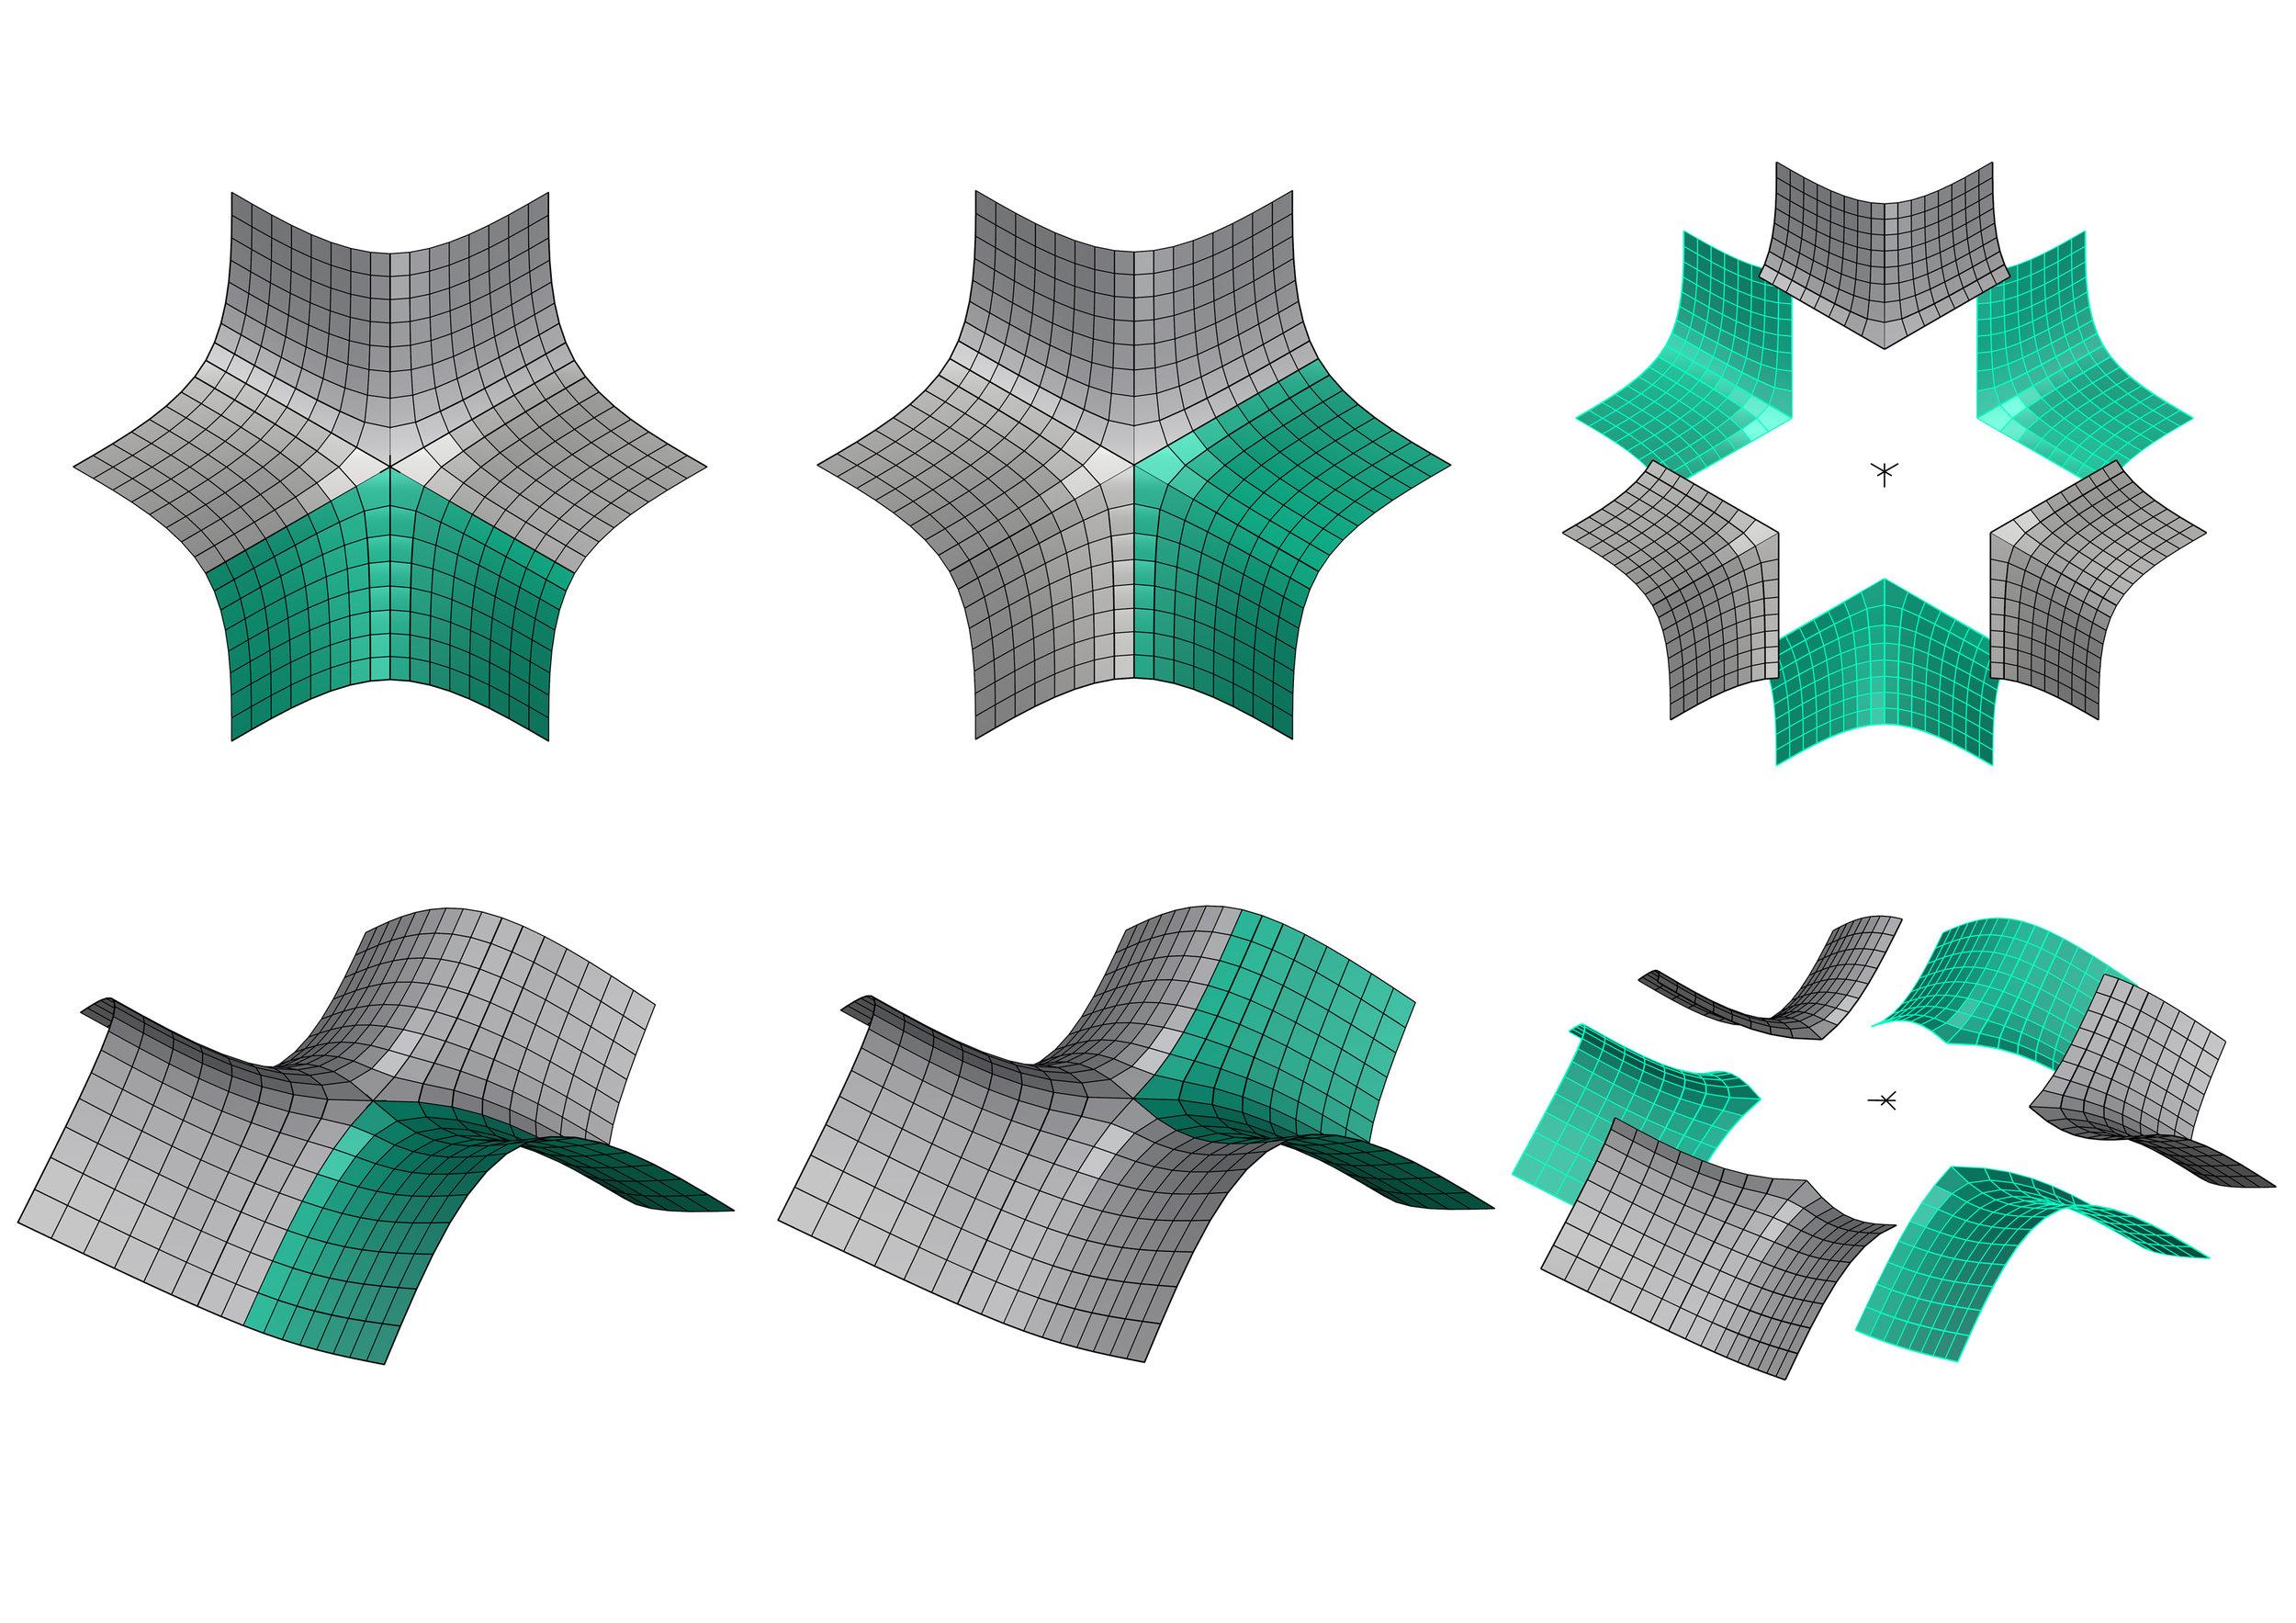 Kintetic Tiling 003.jpg